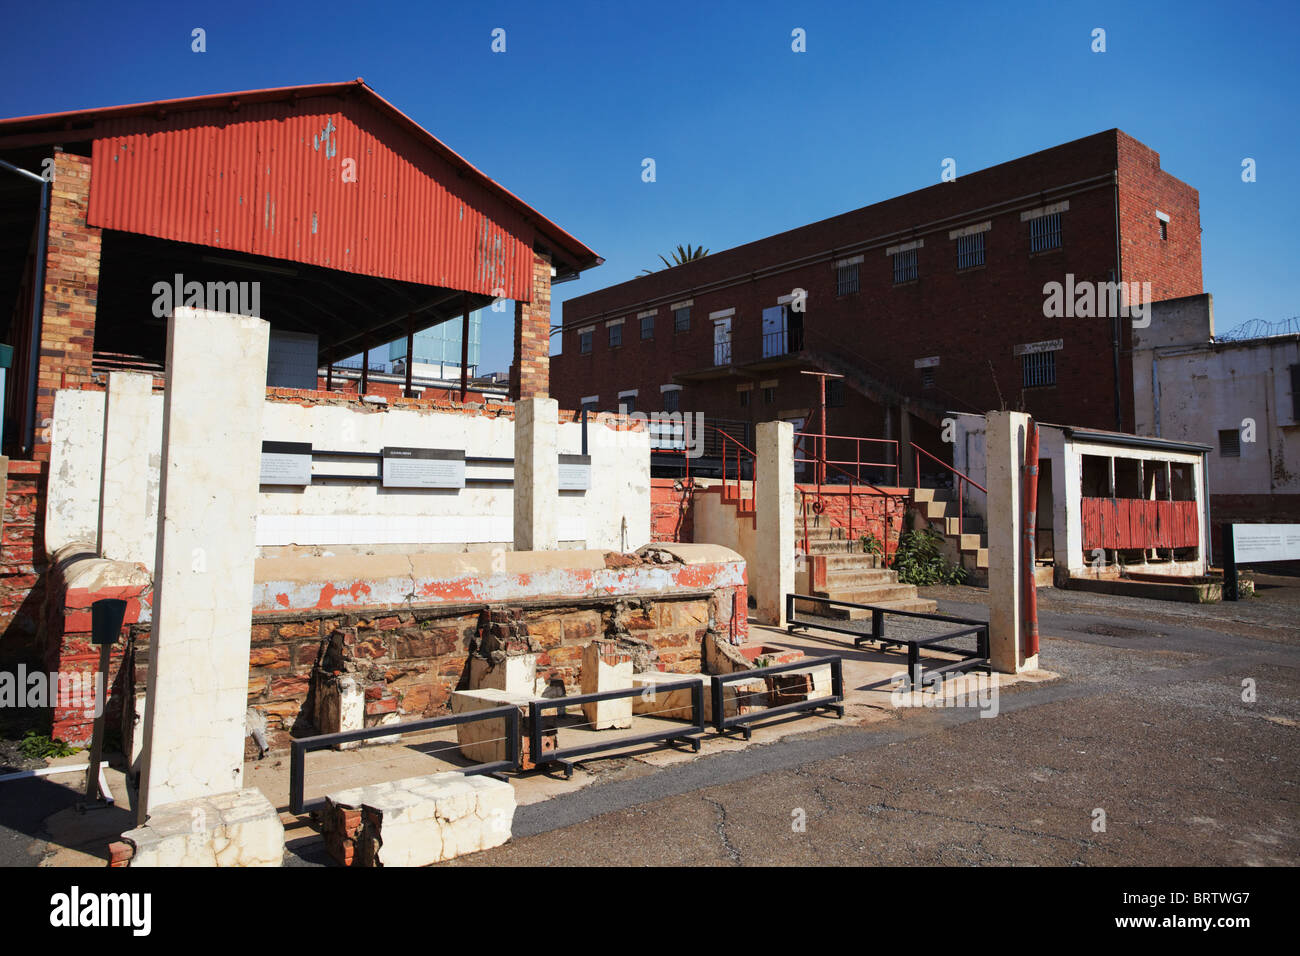 Interior of Constitution Hill (former Apartheid prison), Hillbrow, Johannesburg, Gauteng, South Africa - Stock Image